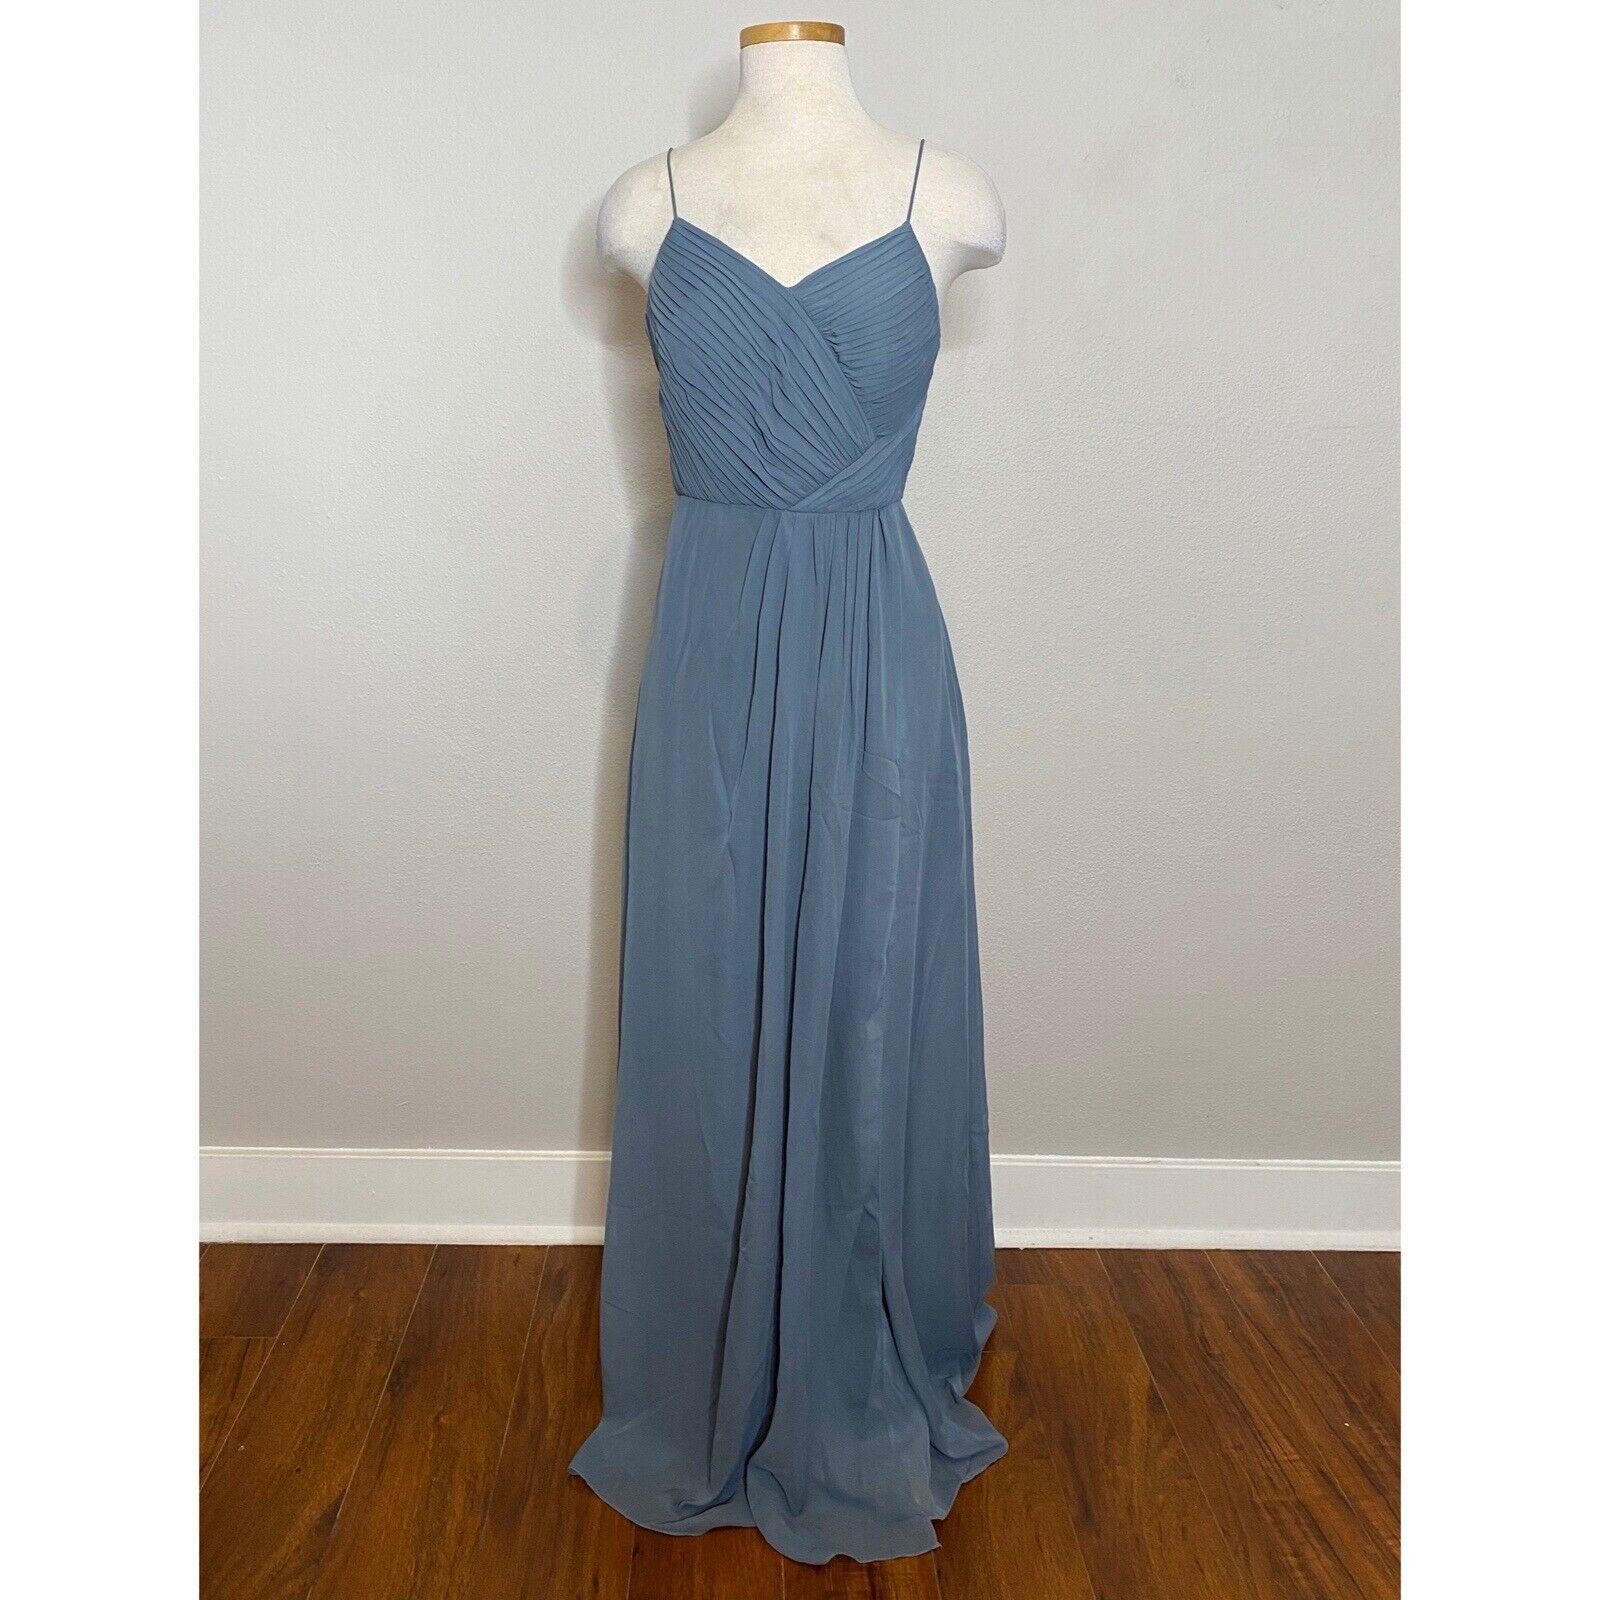 Weddington Way Camille Sleeveless Blue Bridesmaid Maxi Dress Gown Womens 4